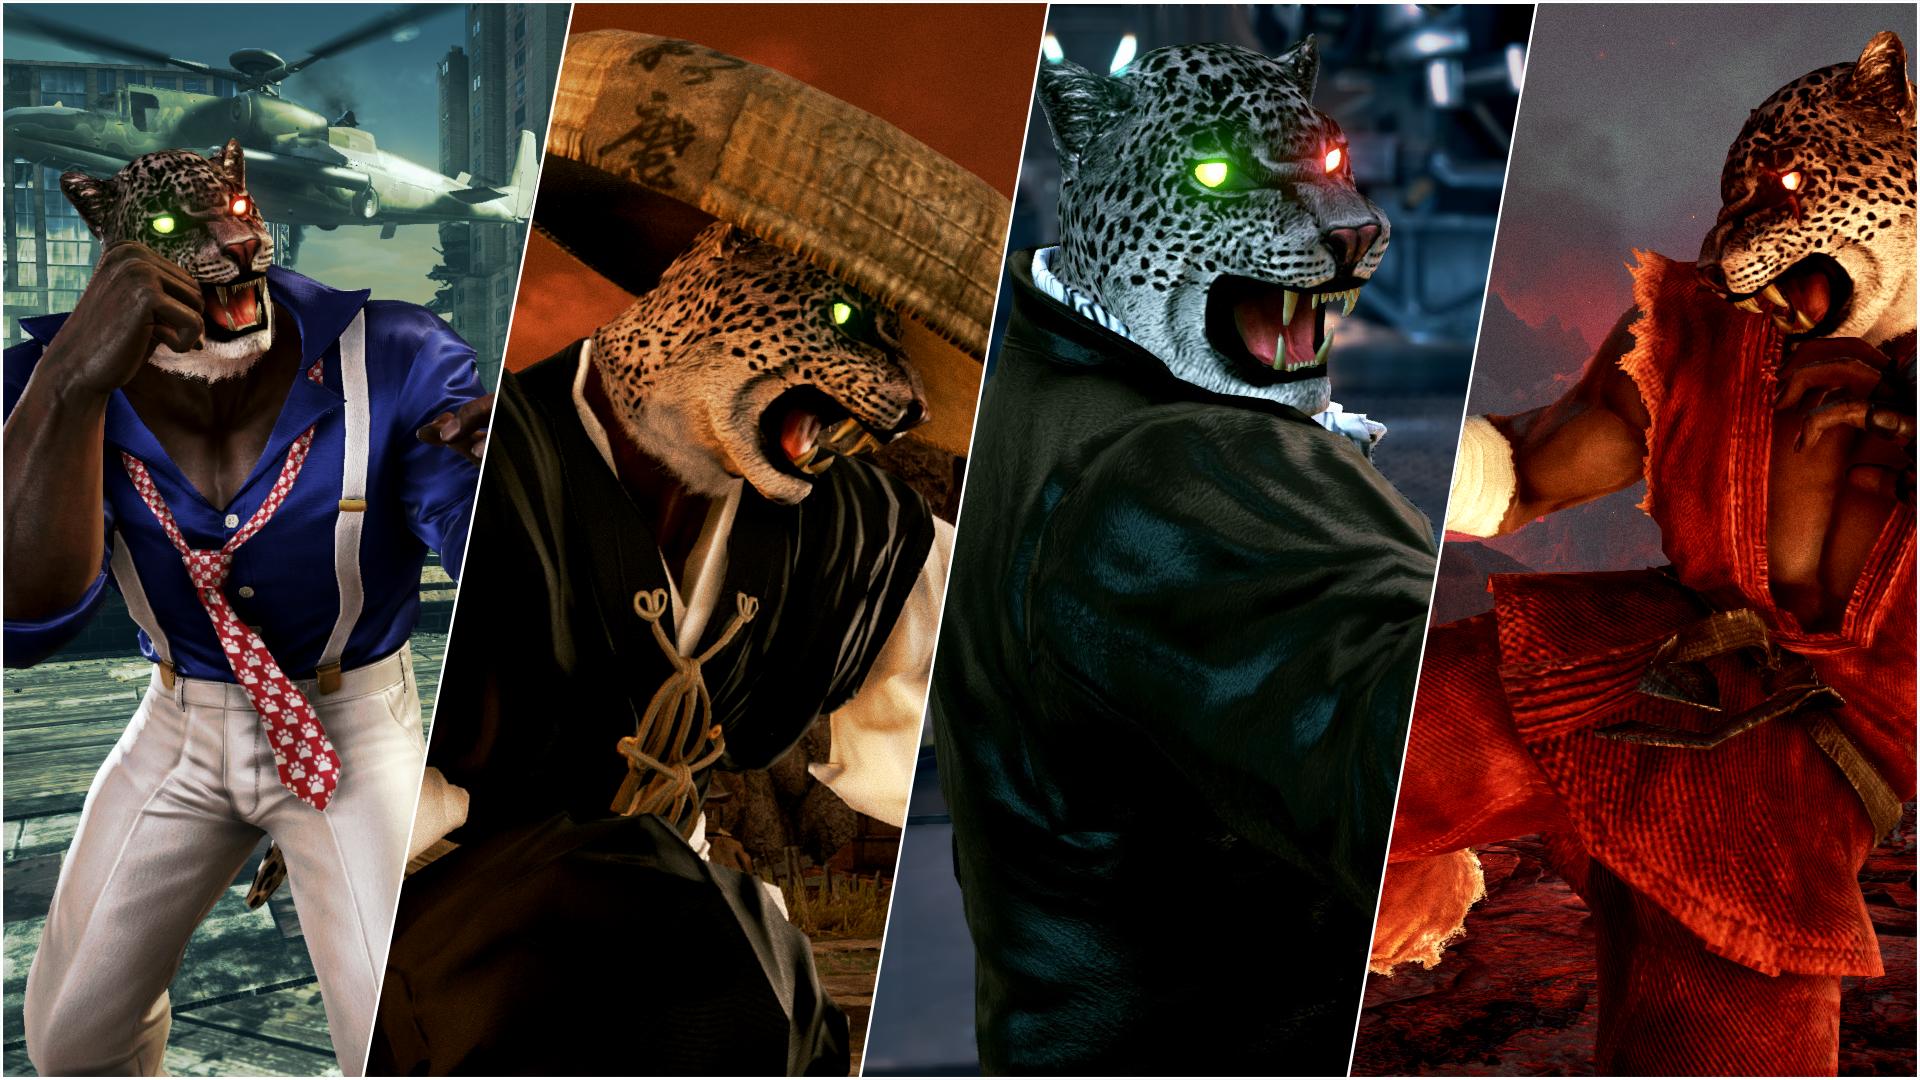 Tekken 7 Armor King Mod Pack2 By Soupforsiuts On Deviantart